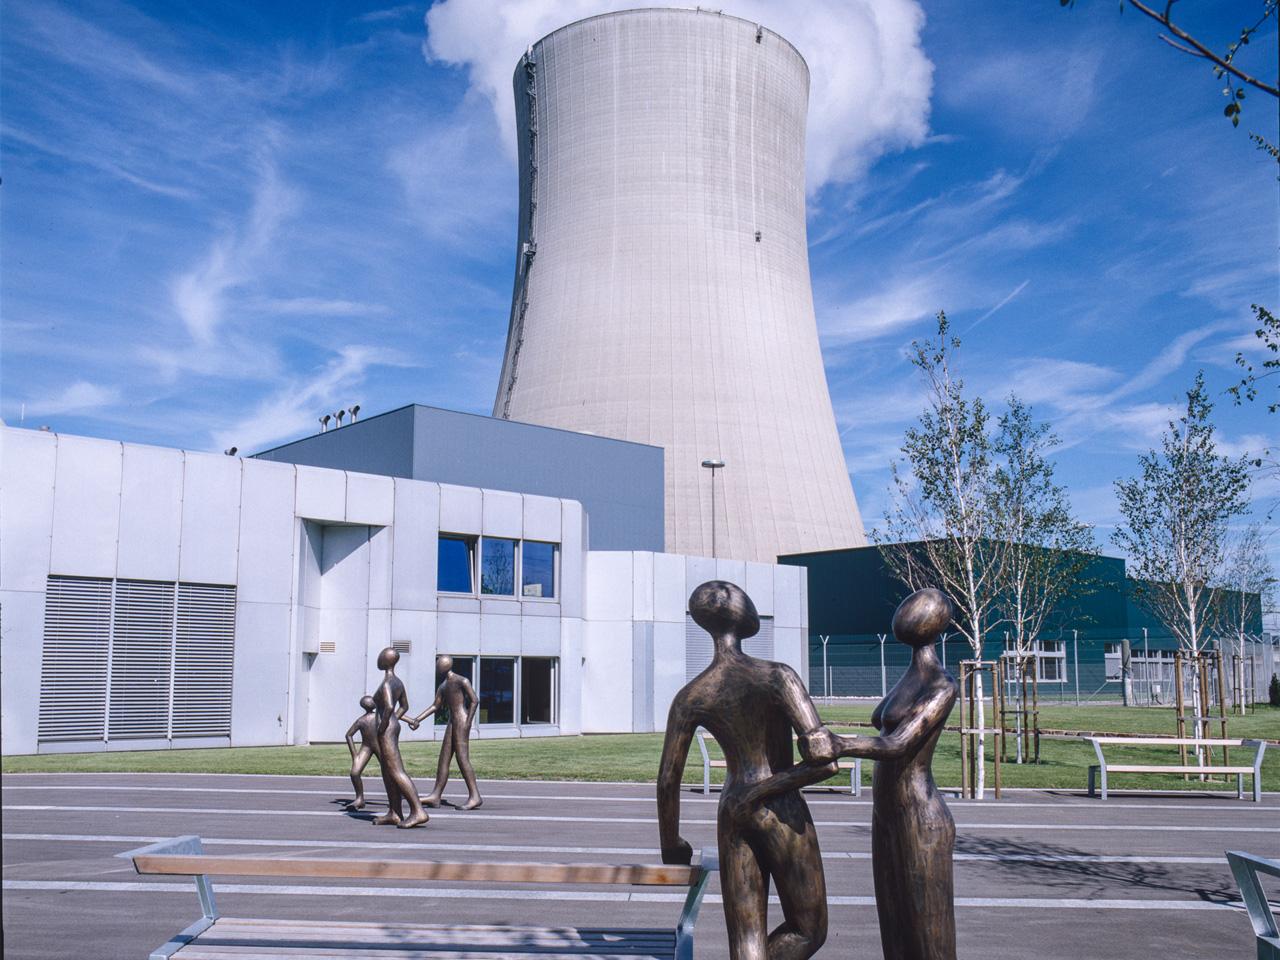 Kernkraftwerk Gösgen – Werkrundgang